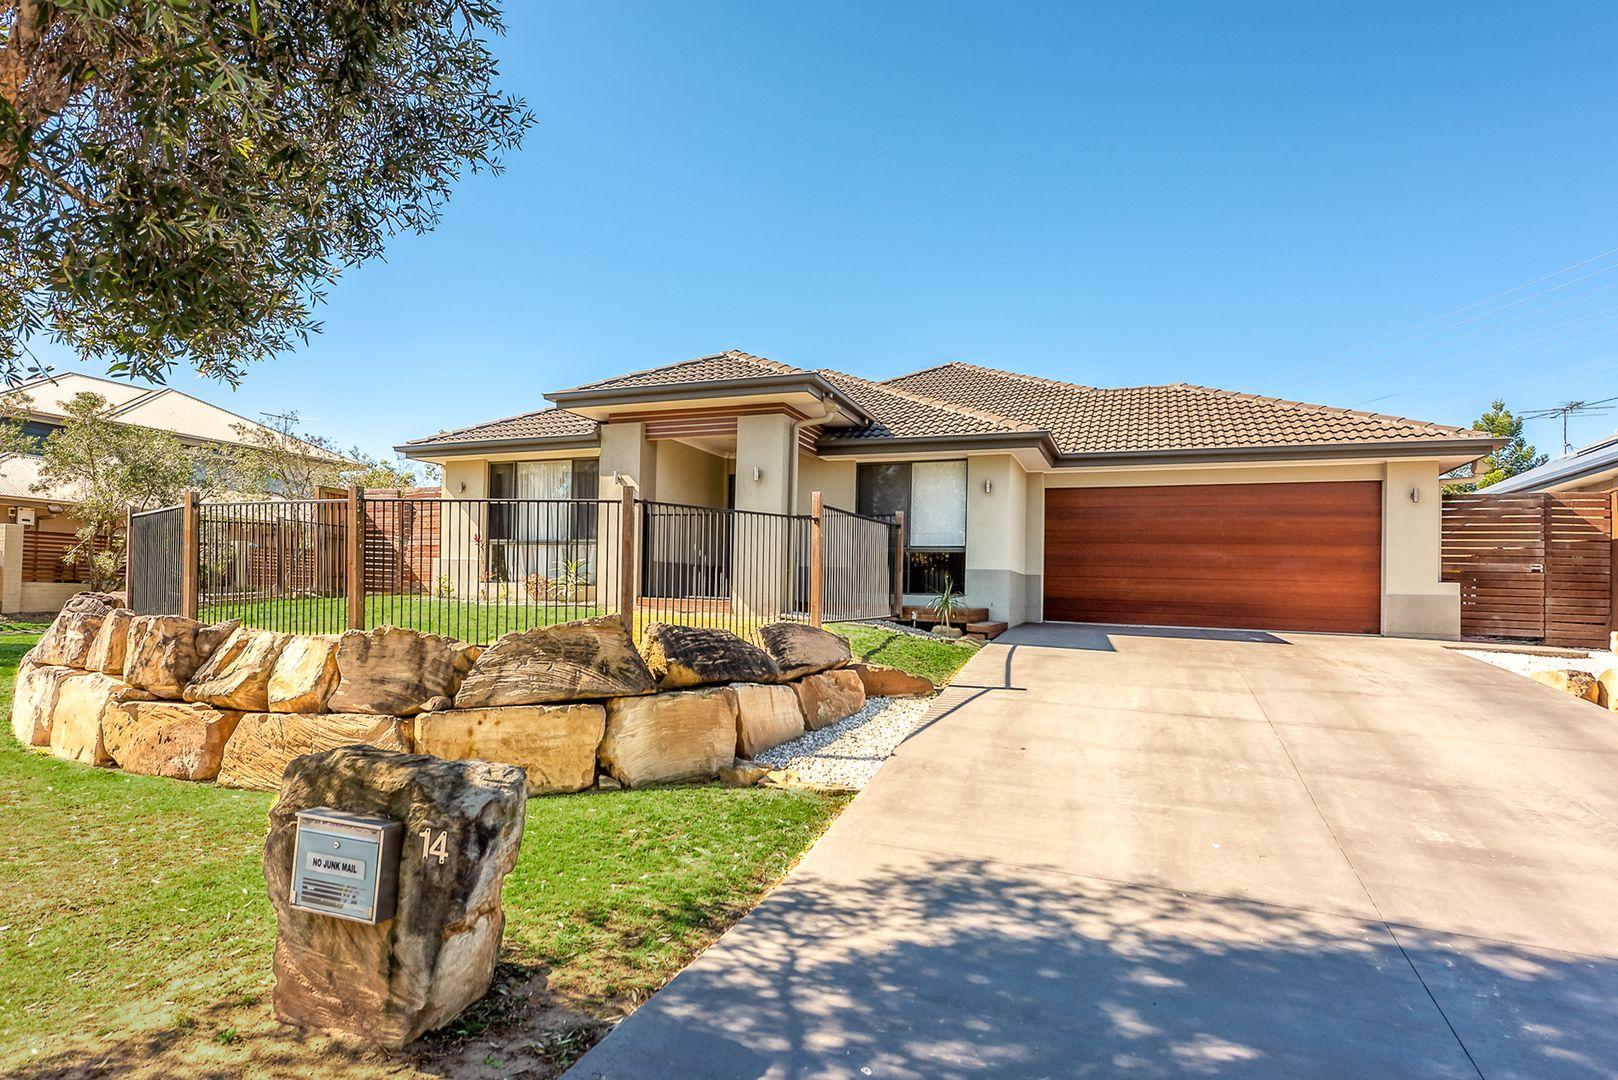 14 Lennox Close, Manly West QLD 4179, Image 0